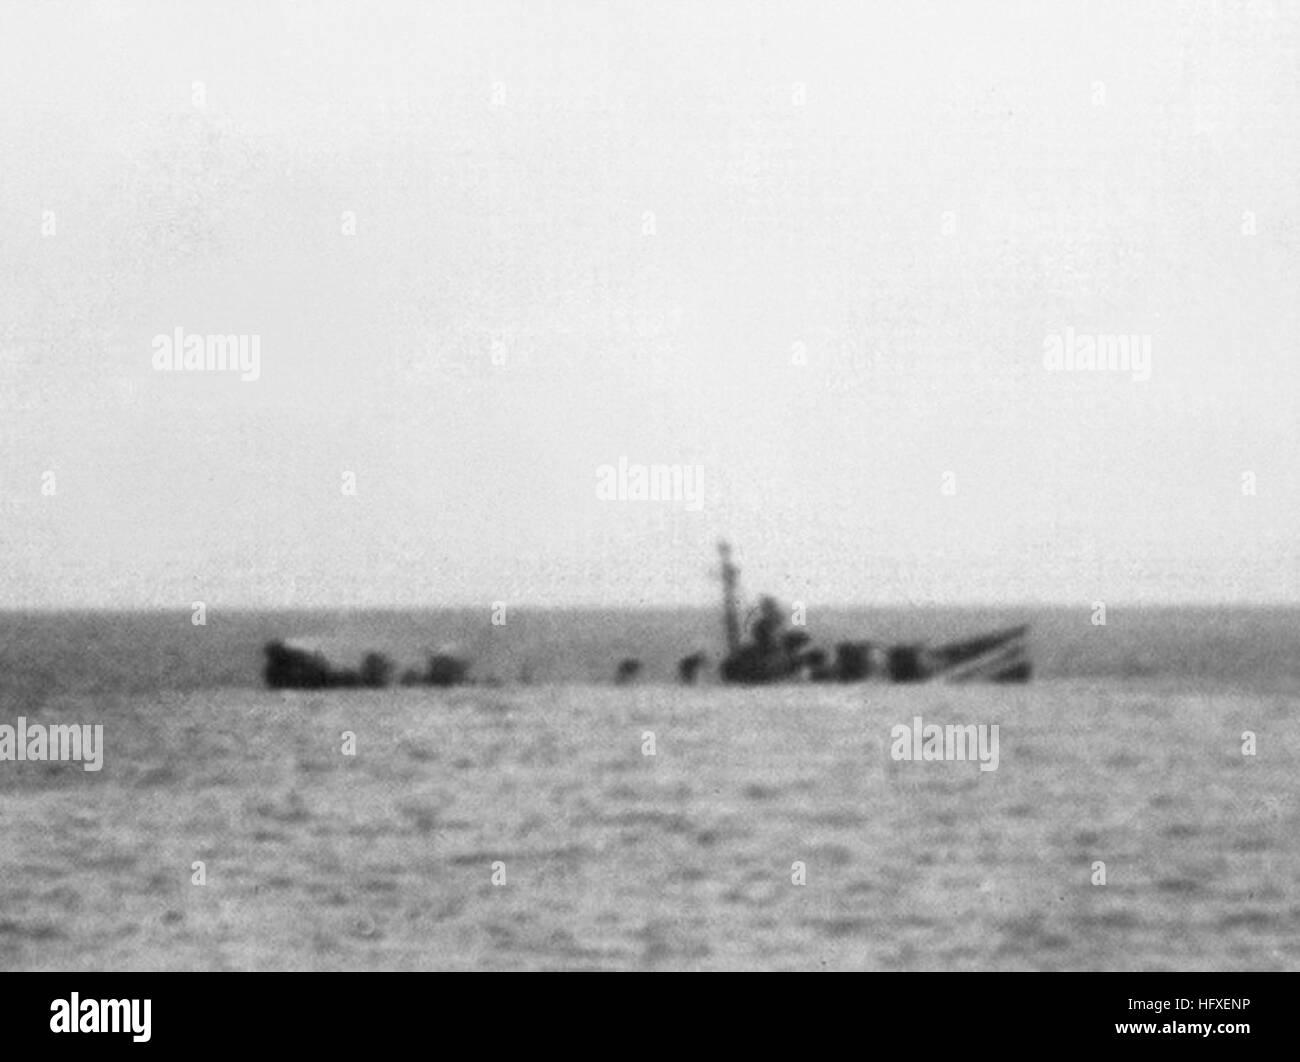 Uss Corry Dd 463 Sinking Off Utah Beach 6 June 1944 Stock Photo